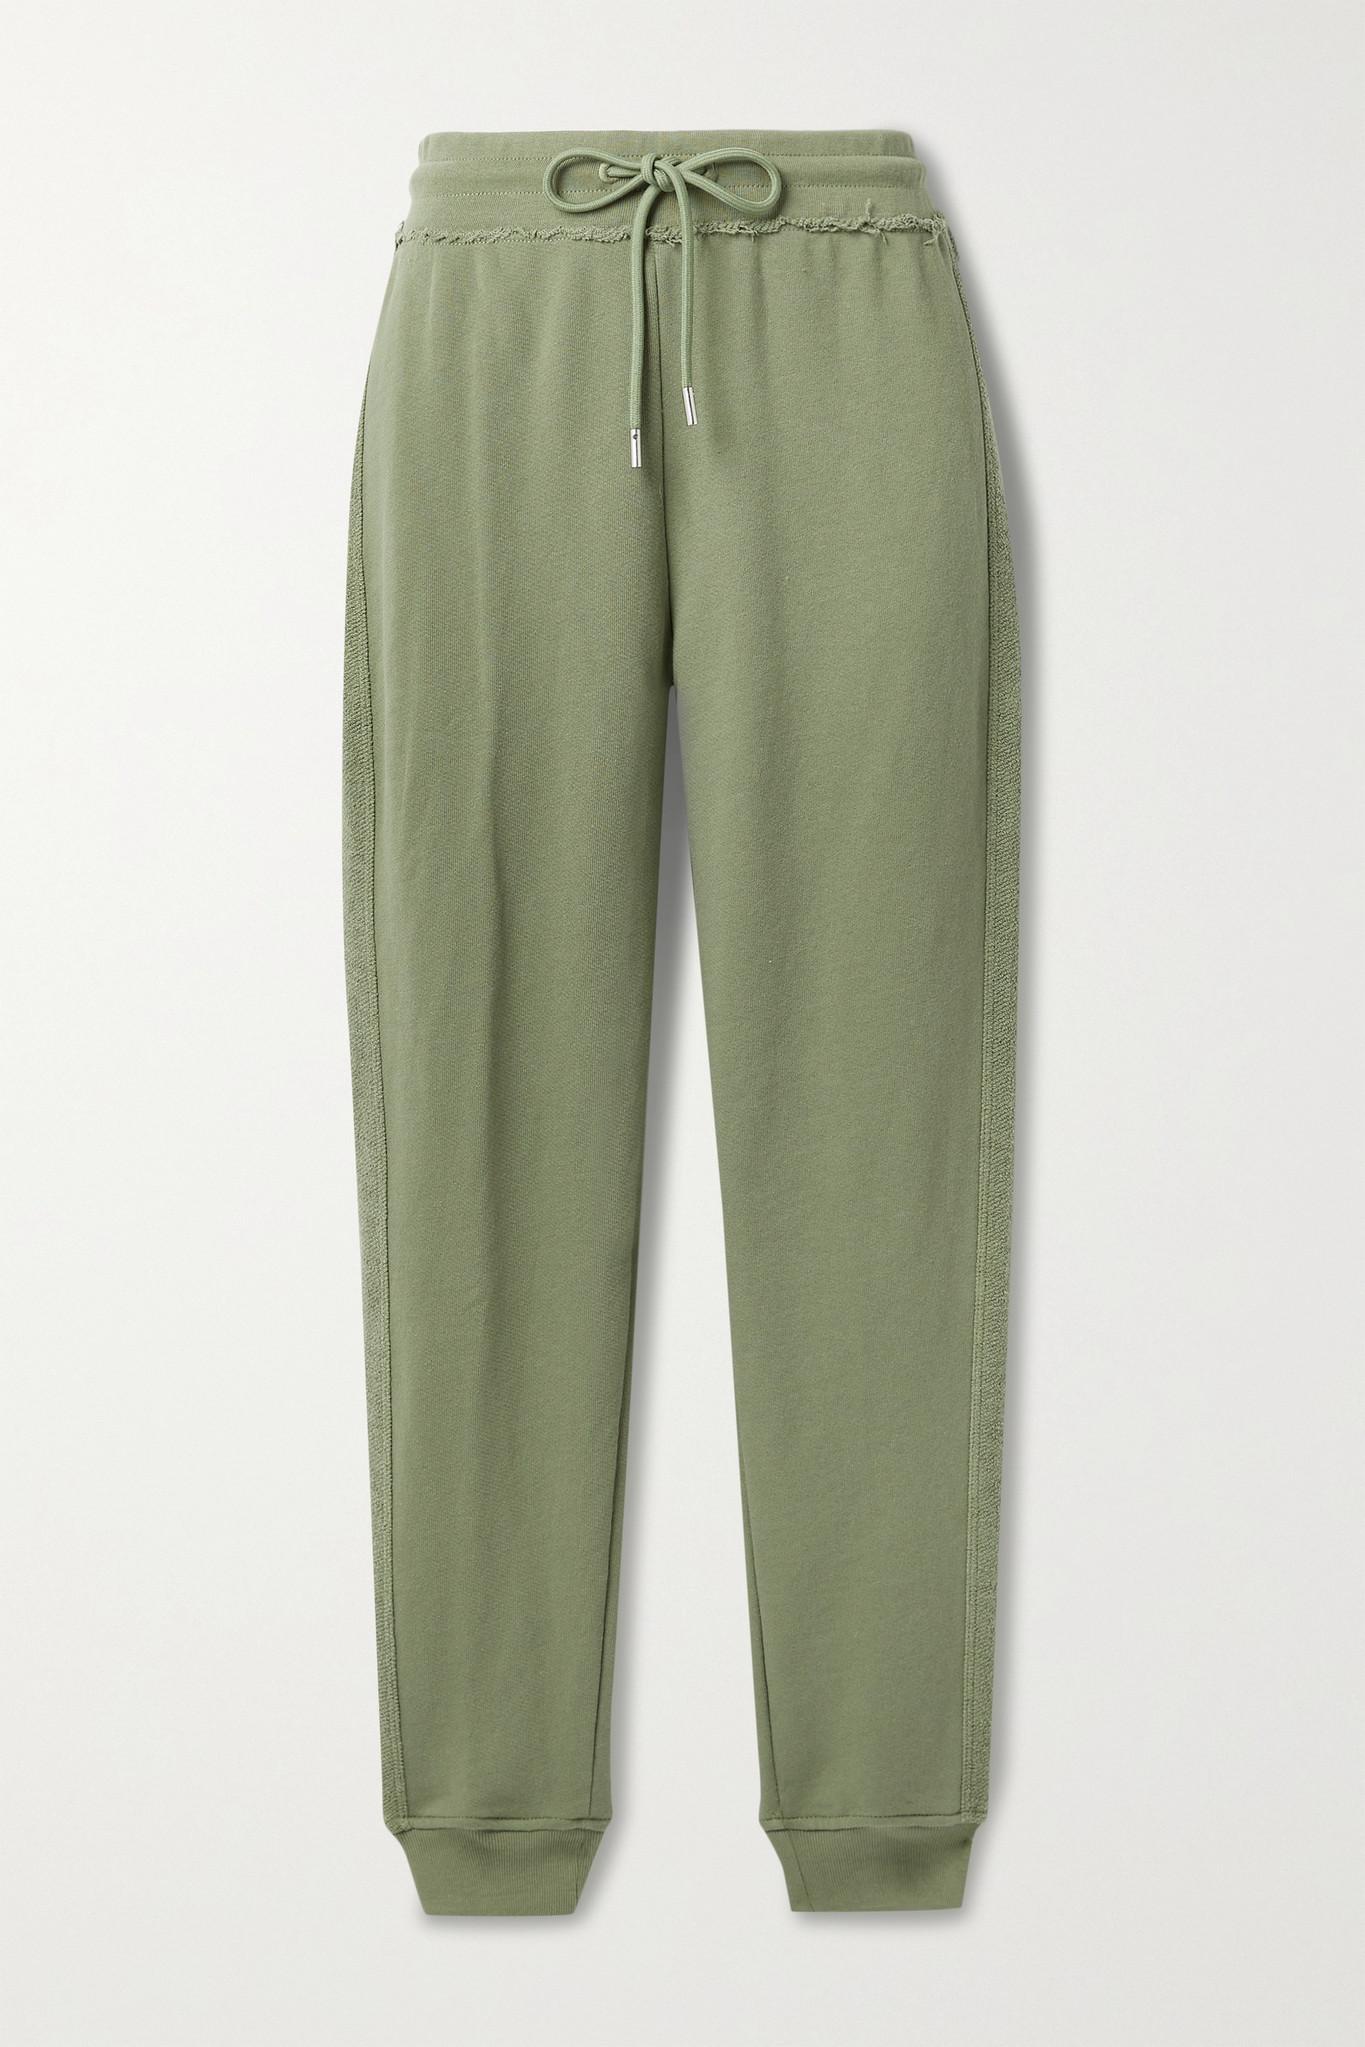 ATM ANTHONY THOMAS MELILLO - 毛边法国纯棉毛巾布休闲裤 - 绿色 - large